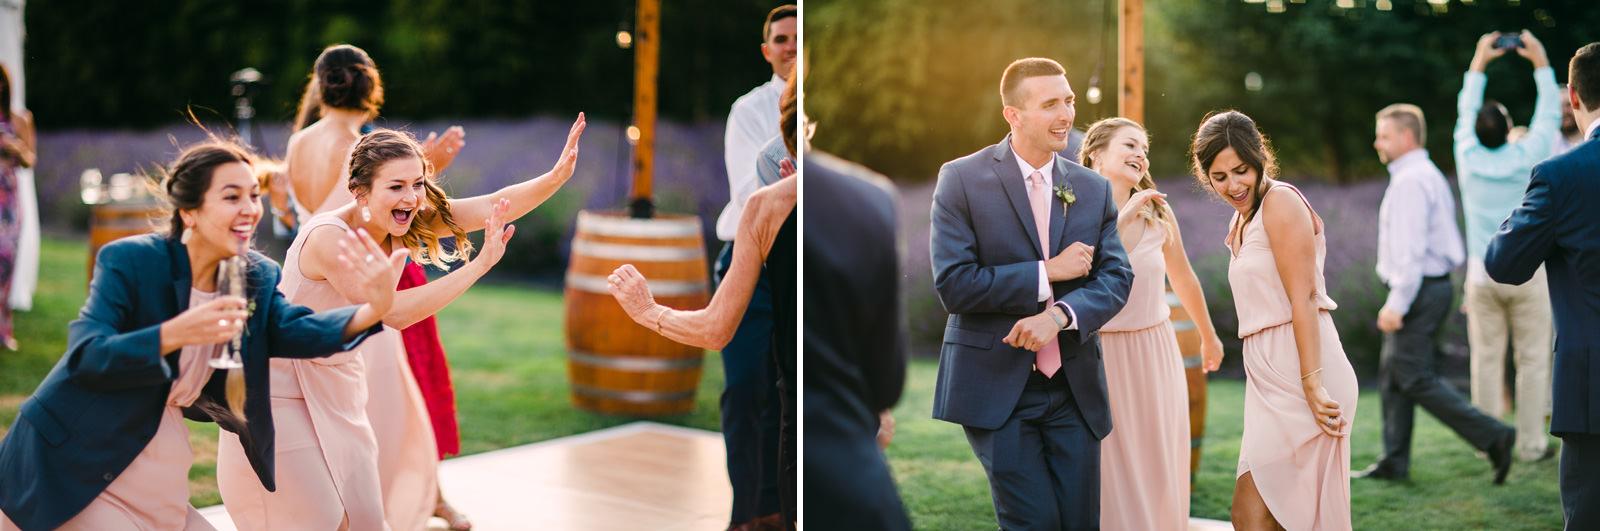 092-woodinville-lavendar-farm-wedding-with-golden-glowy-photos.jpg